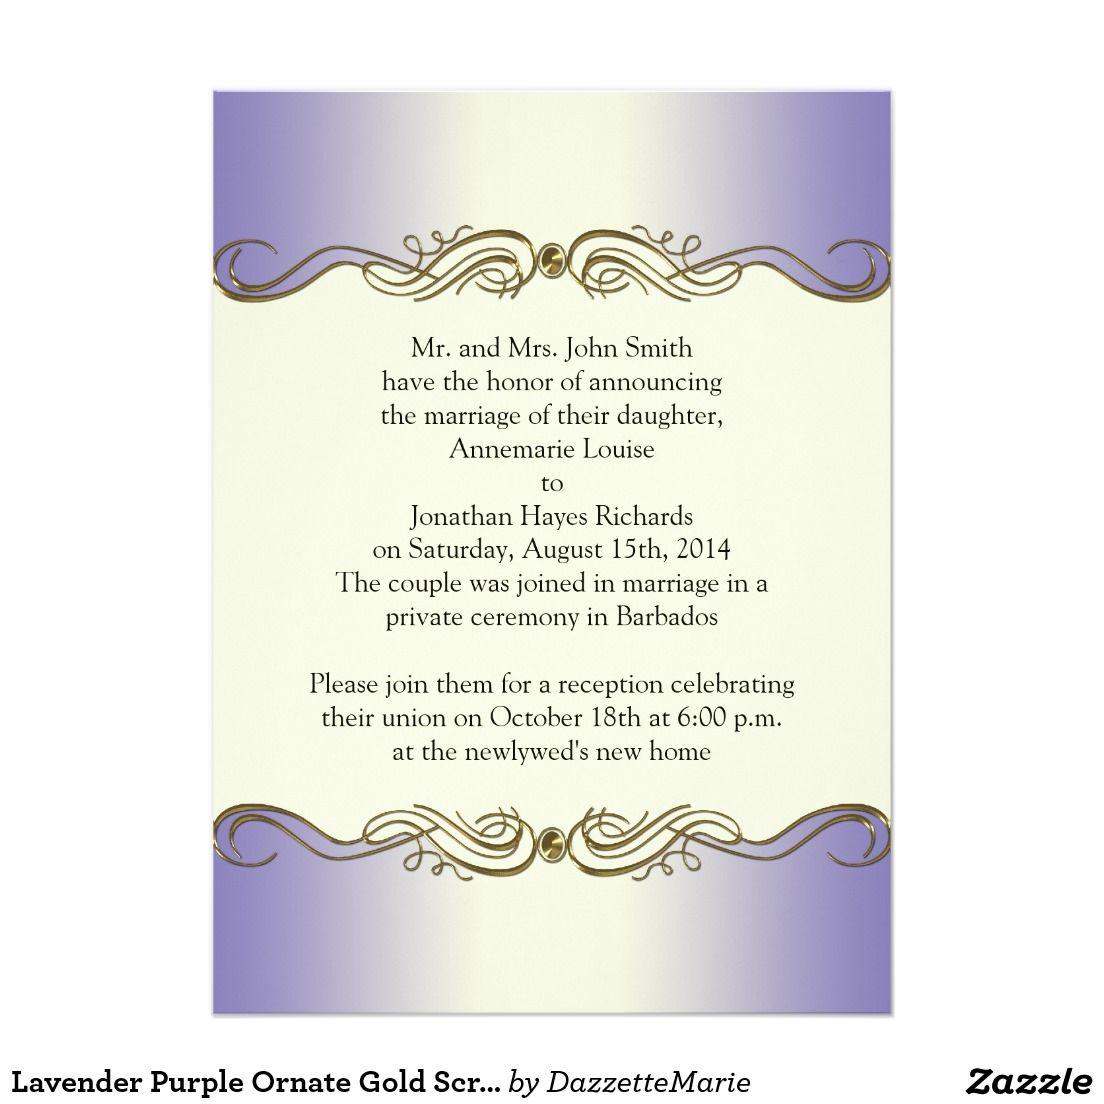 Wedding invitations wedding invitation purple gold ornate - Lavender Purple Ornate Gold Scrolls Post Wedding I Card